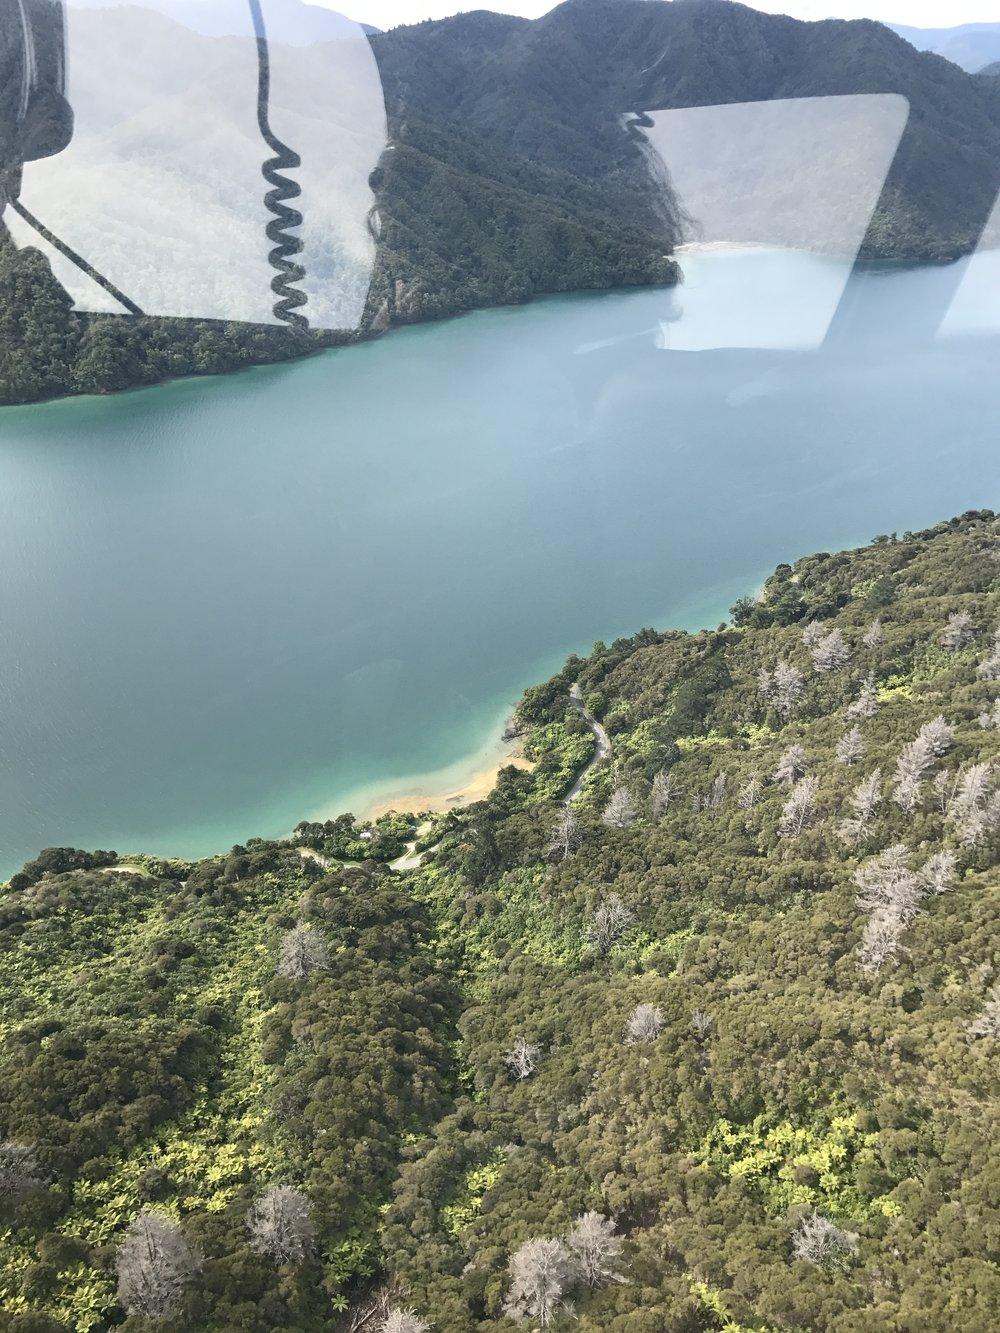 belandbeau_family adventure helicopter ride new zealand_6.jpg